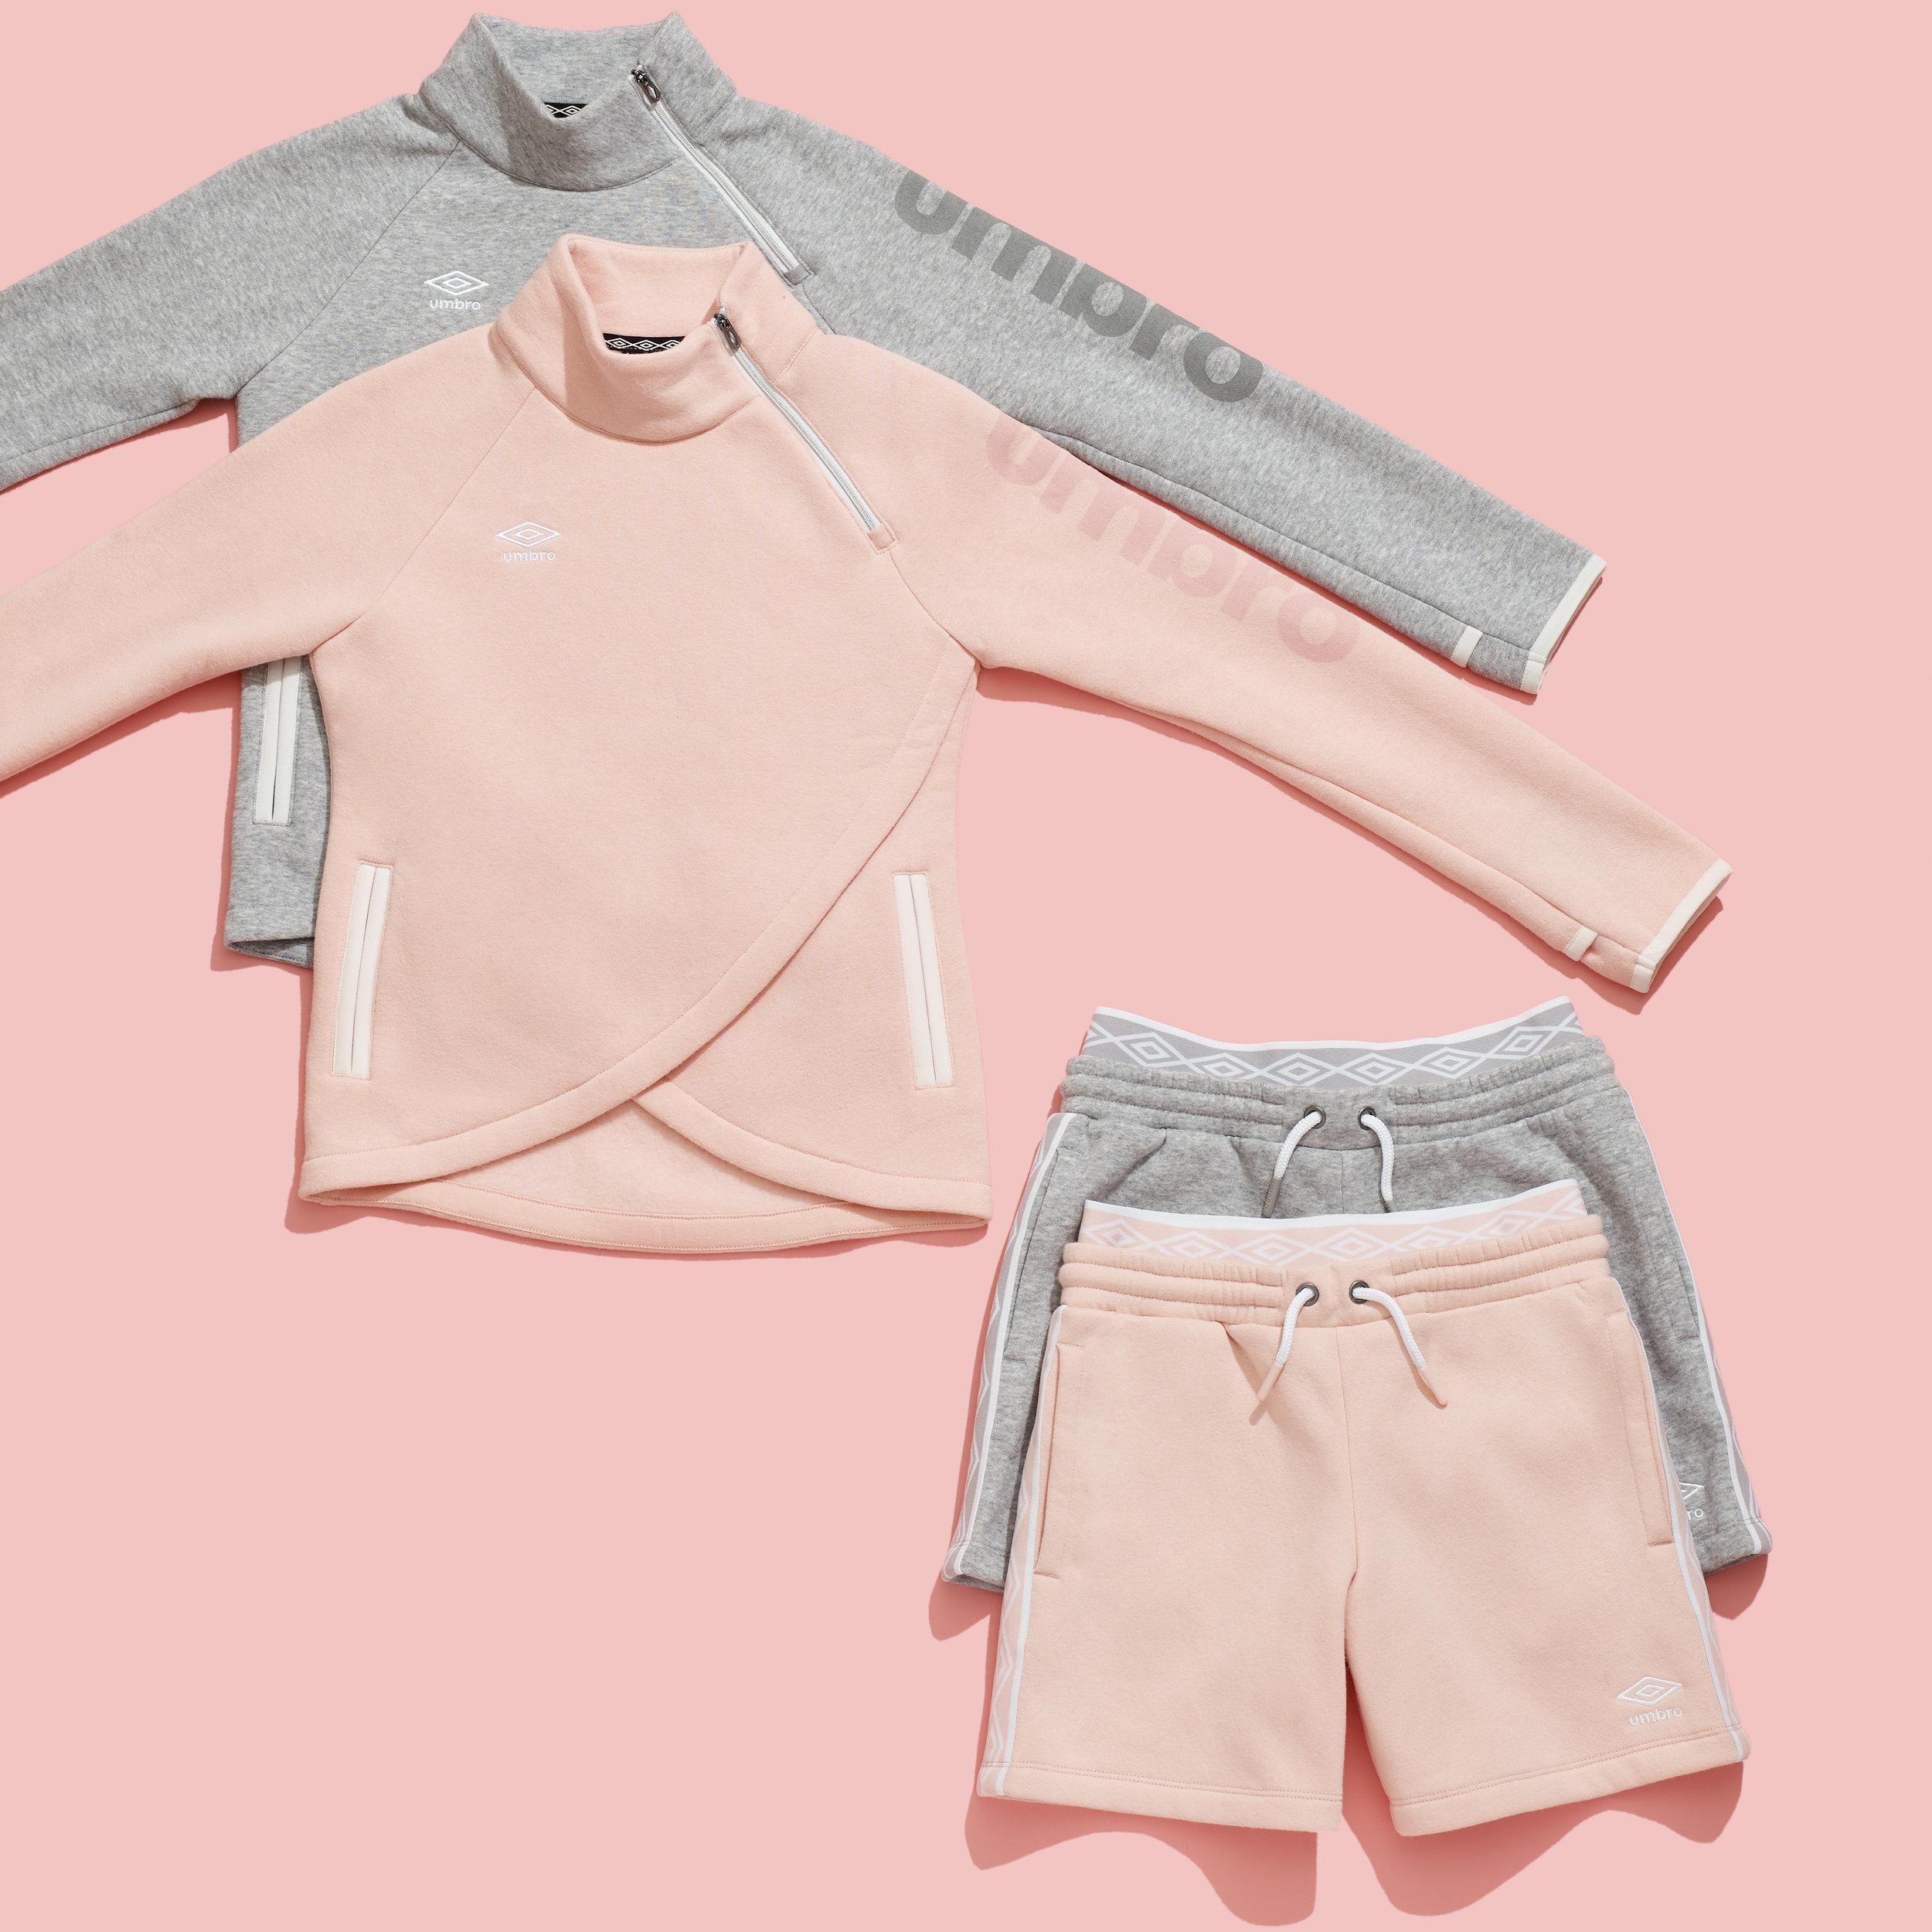 S19_GIRLS_Target_Sweatshirts_123 copy.jpg